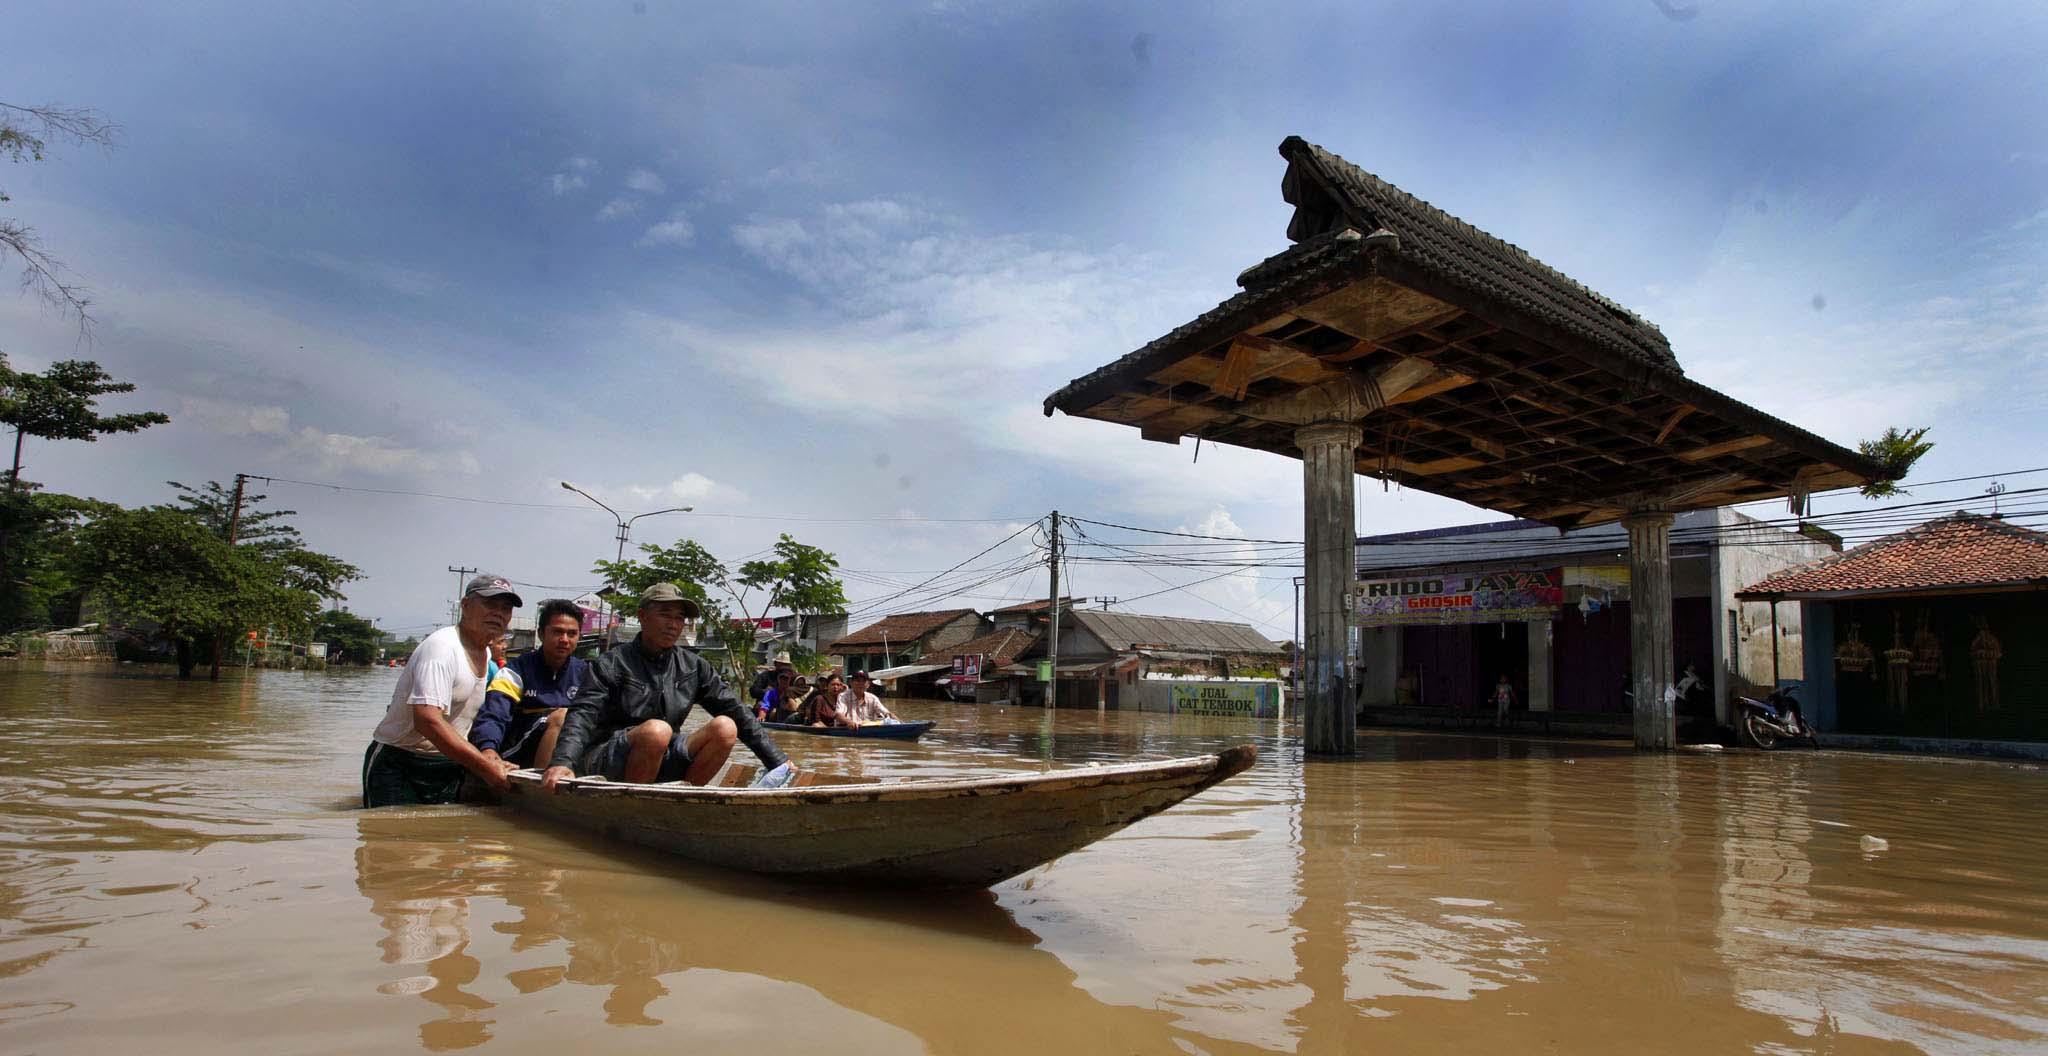 Warga Kampung Cieunteung, Desa Baleendah, Kecamatan Baleendah, Kabupaten Bandung mengevakuasi satu keluarga yang terjebak banjir. Dok